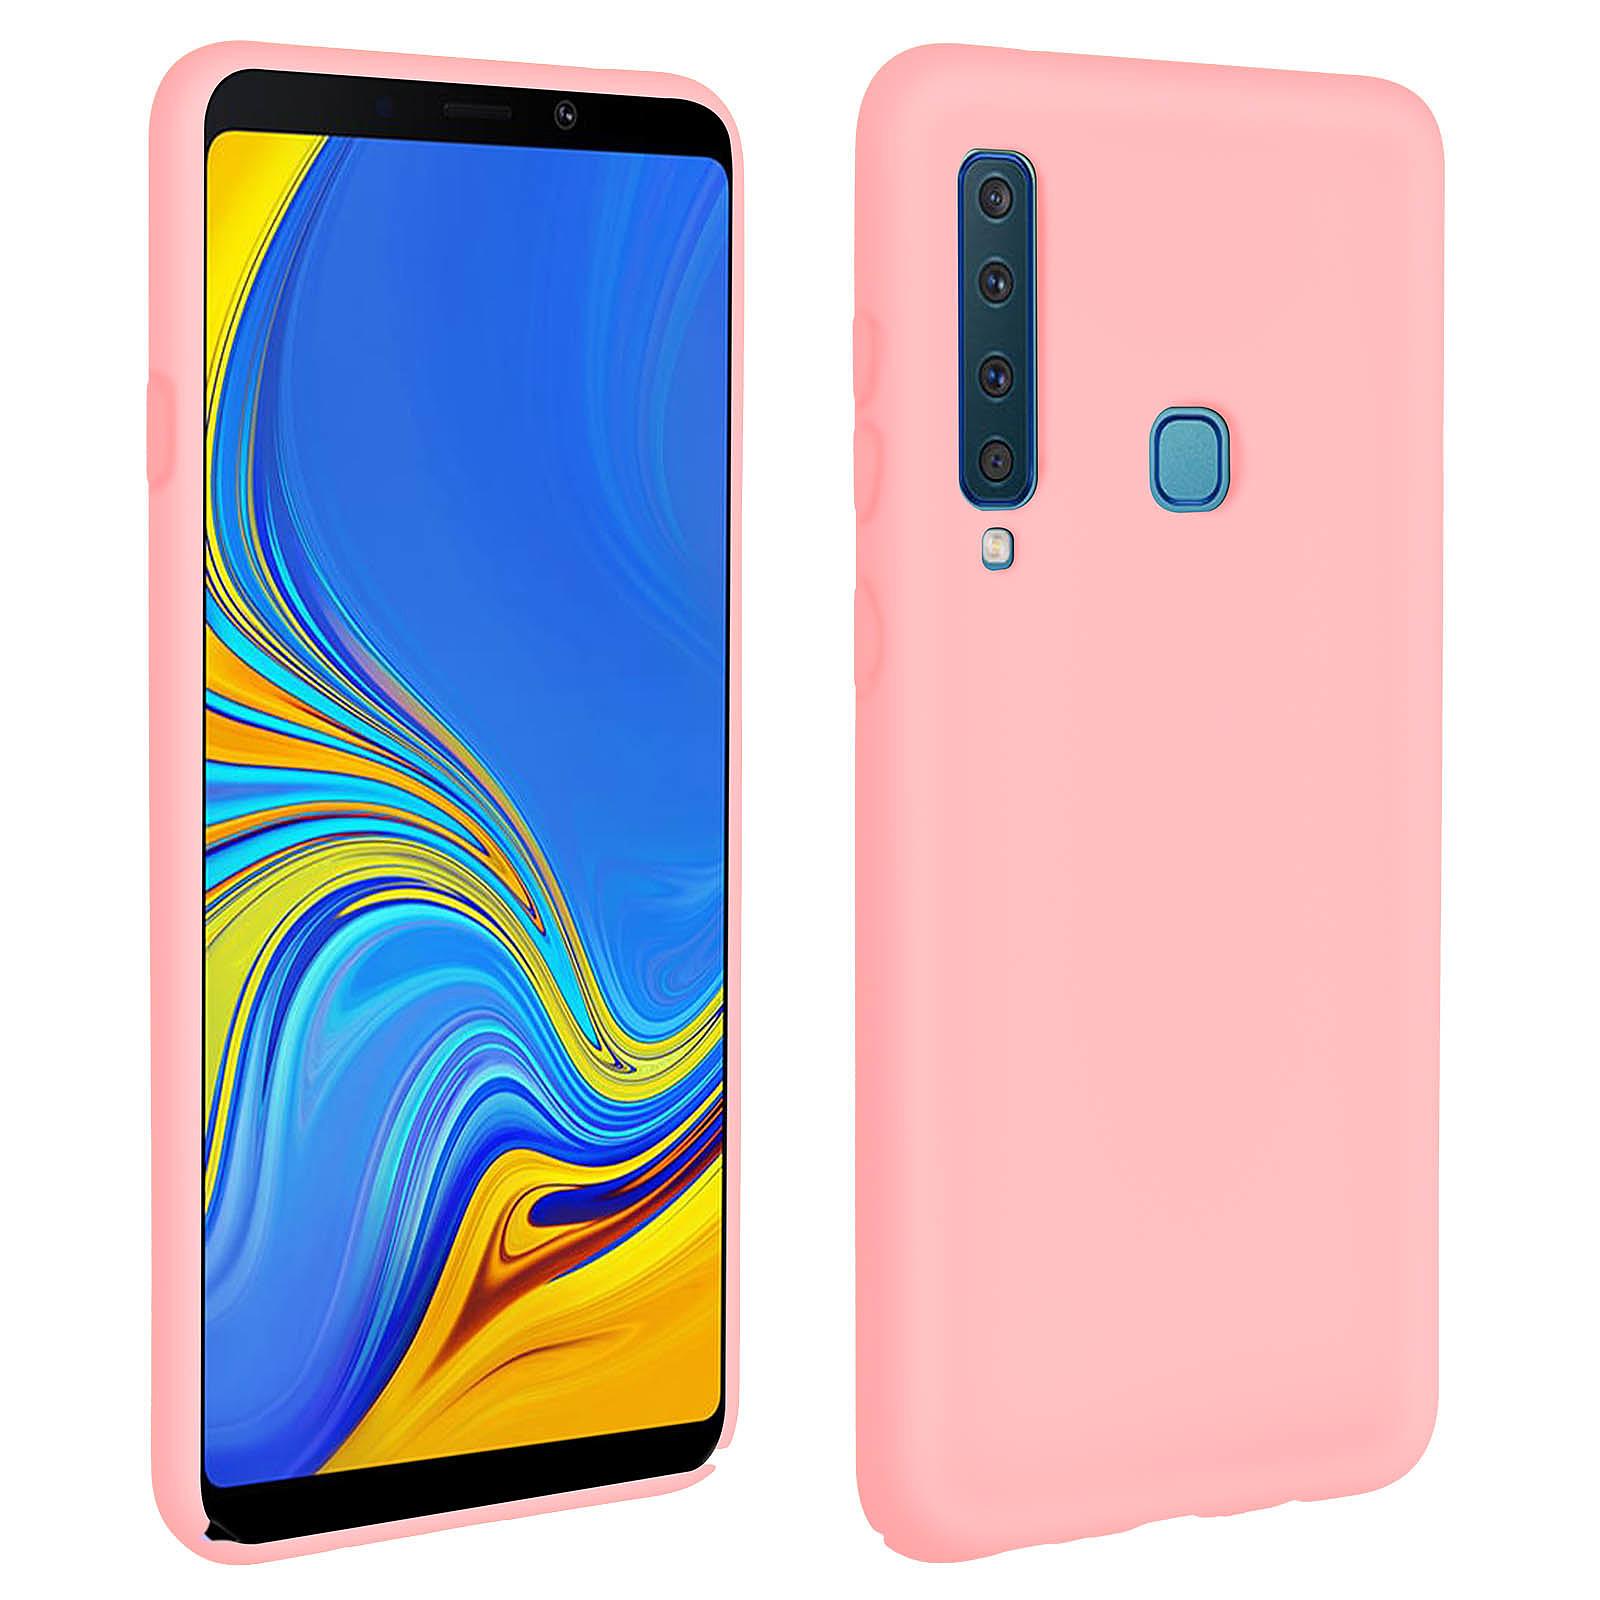 Avizar Coque Rose pour Samsung Galaxy A9 2018